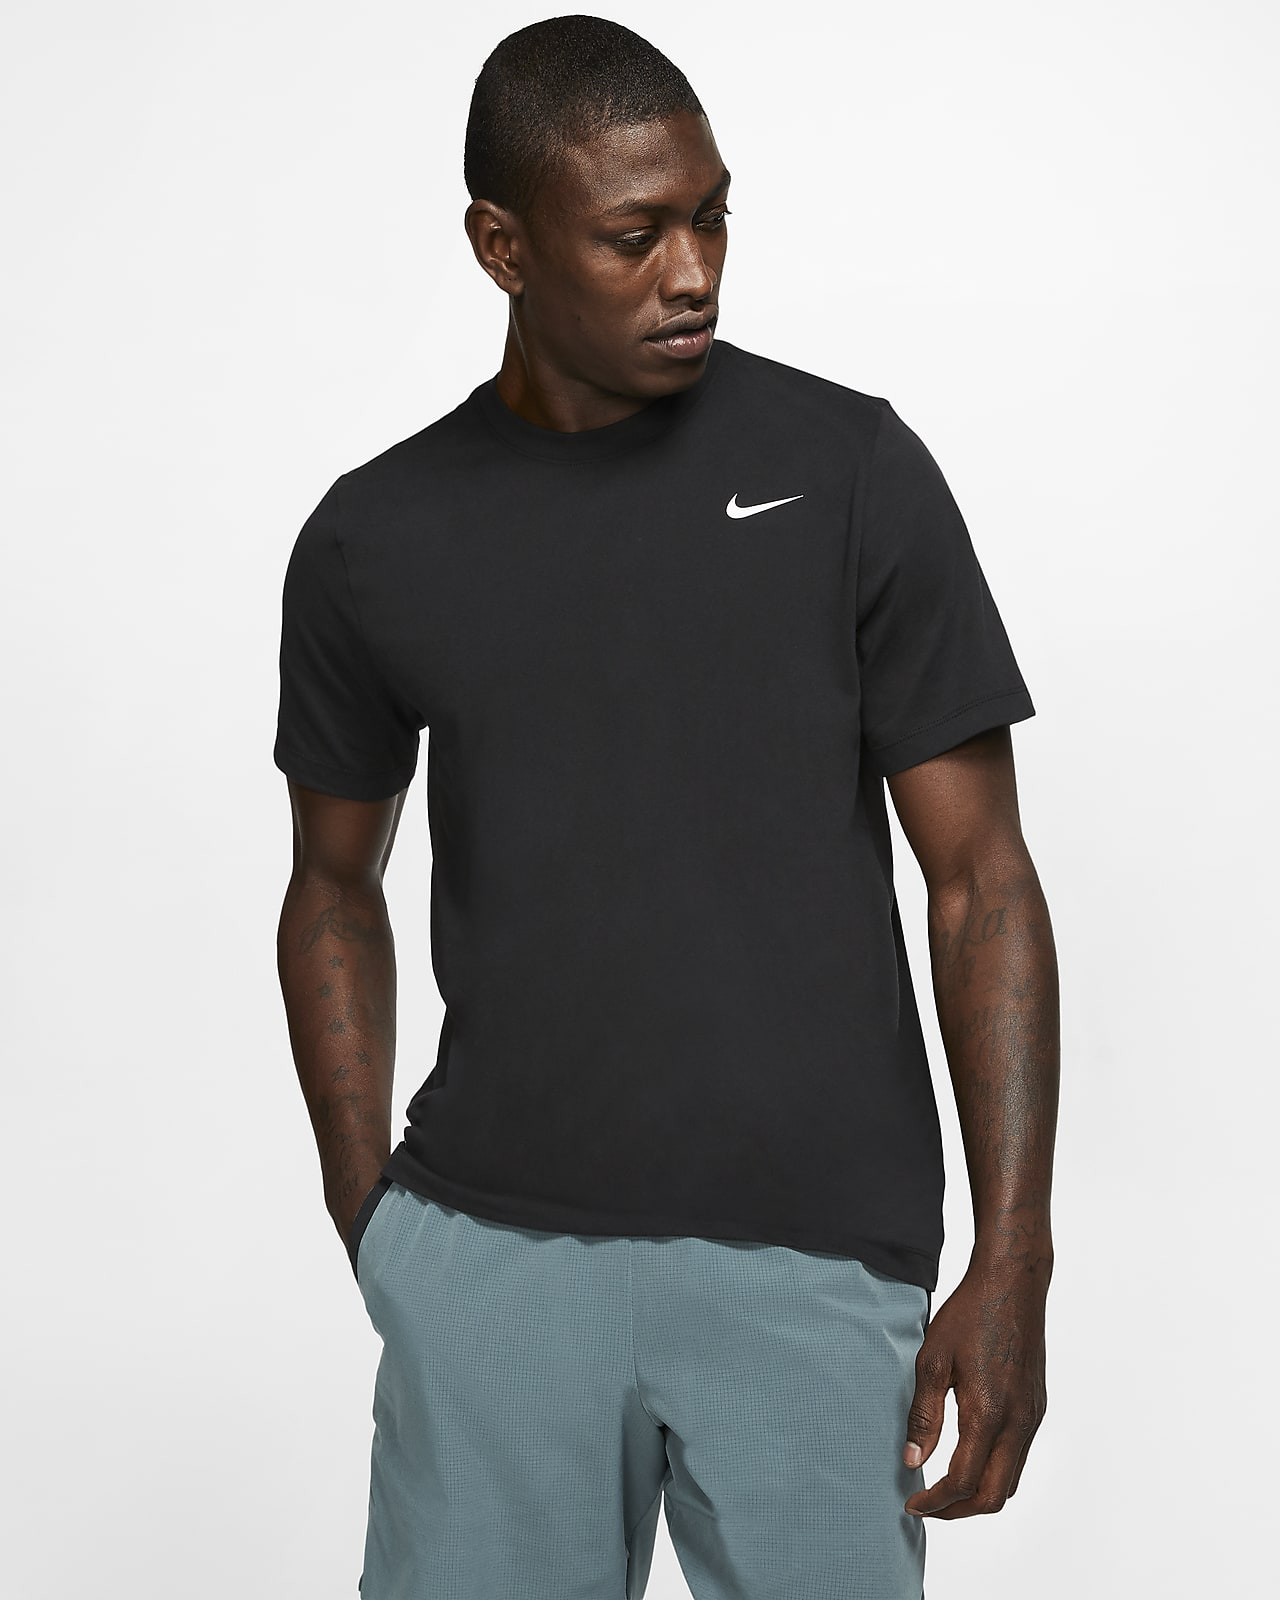 Nike Pro T Shirt, t skjorte herre Svart Trening t